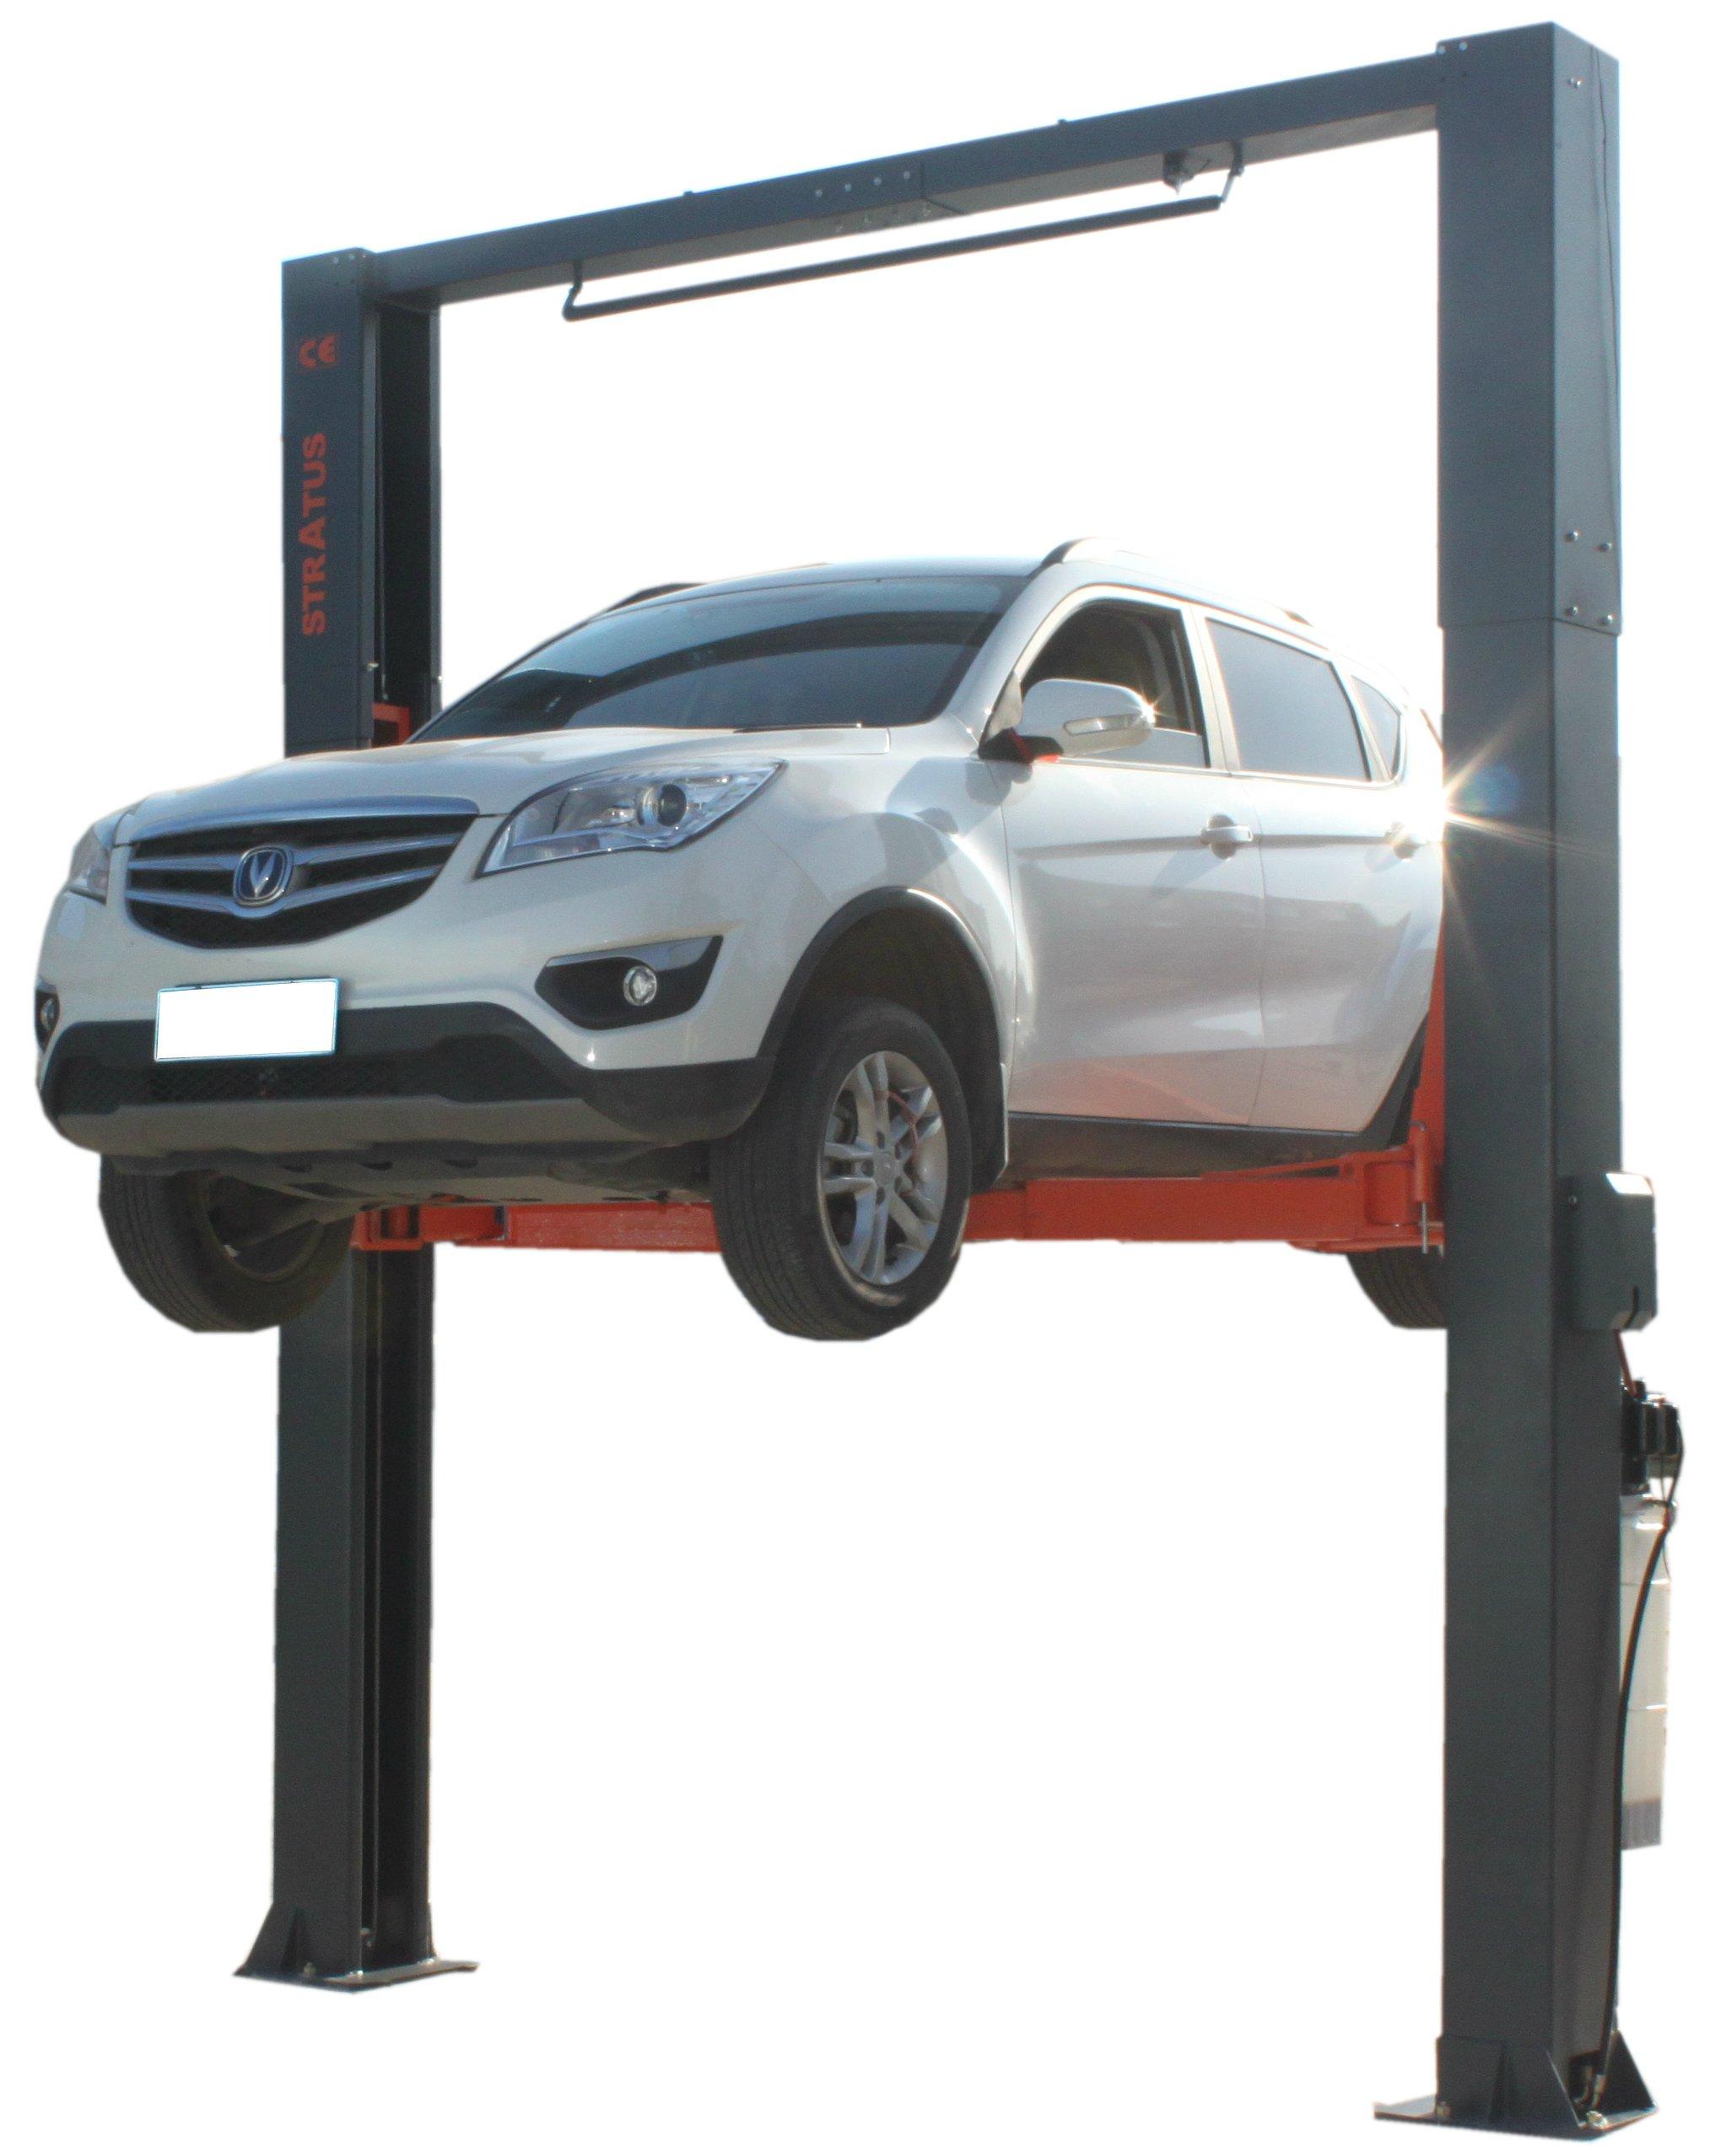 Stratus Overhead 14,000 lbs Capacity Direct Drive Car Lift Auto Hoist by STRATUS (Image #1)